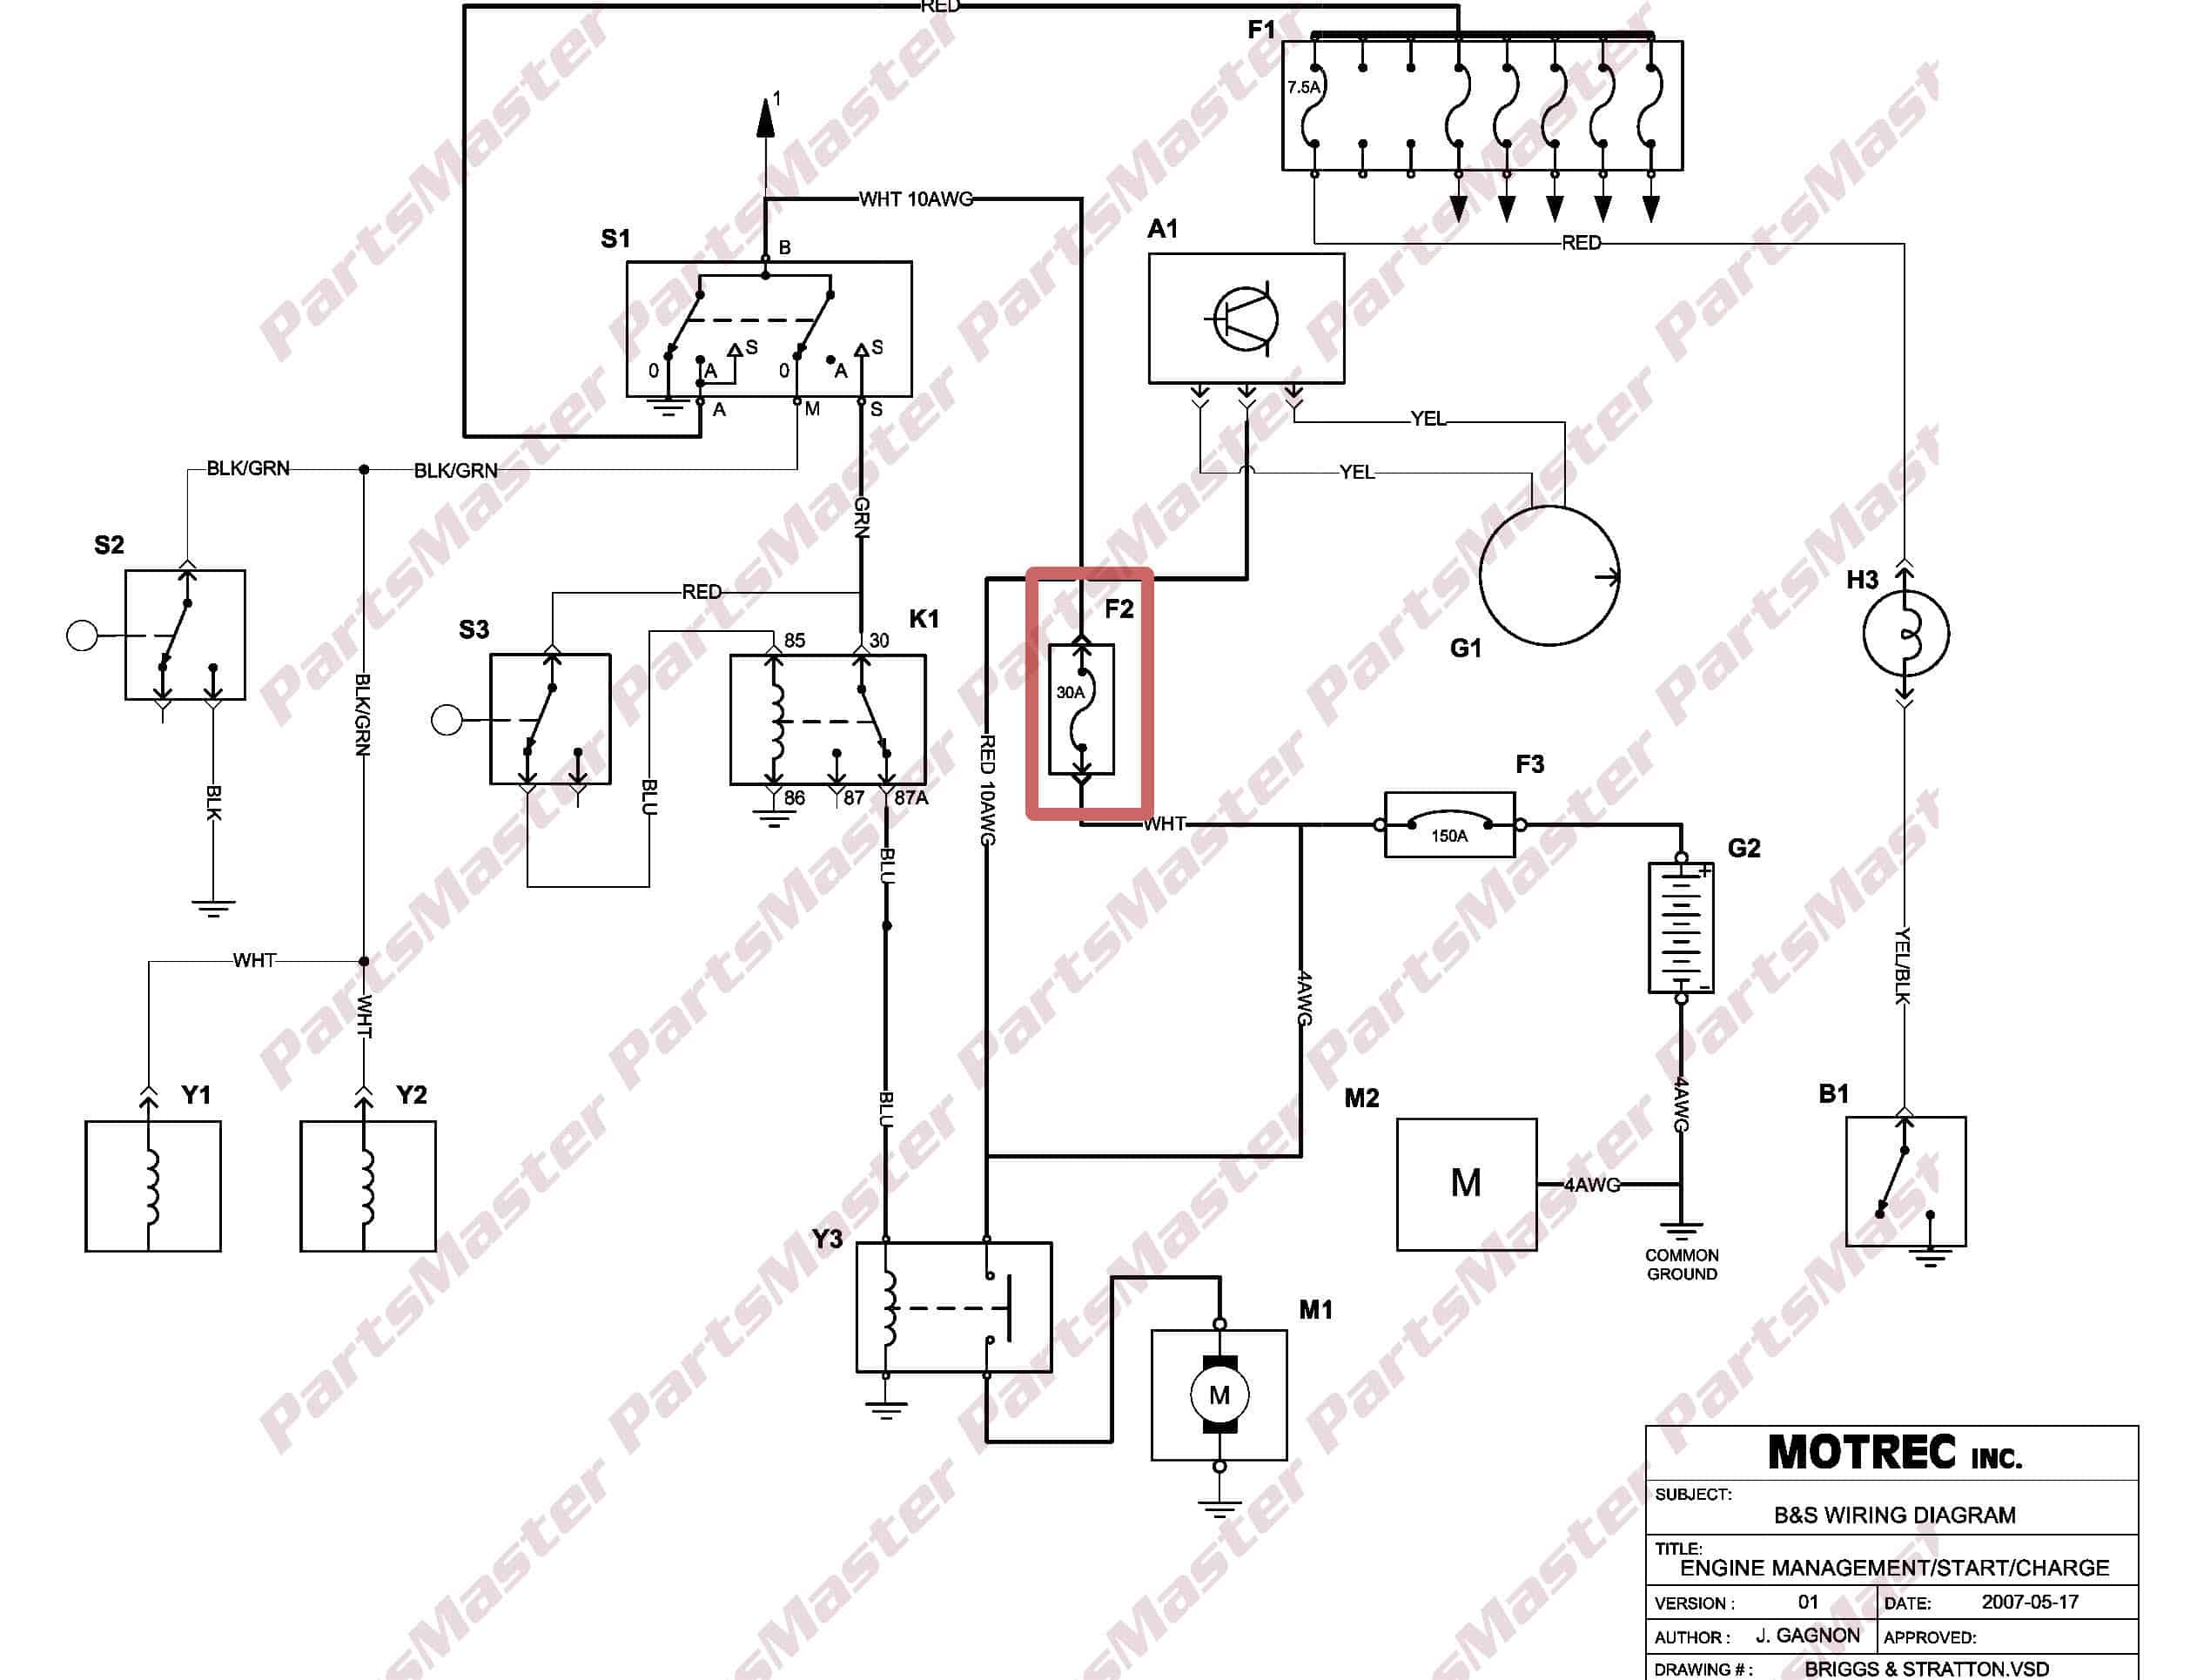 motrec page 16 partsmaster inc rh partsmasterusa com motrec wiring diagram Motrec Parts Manuals